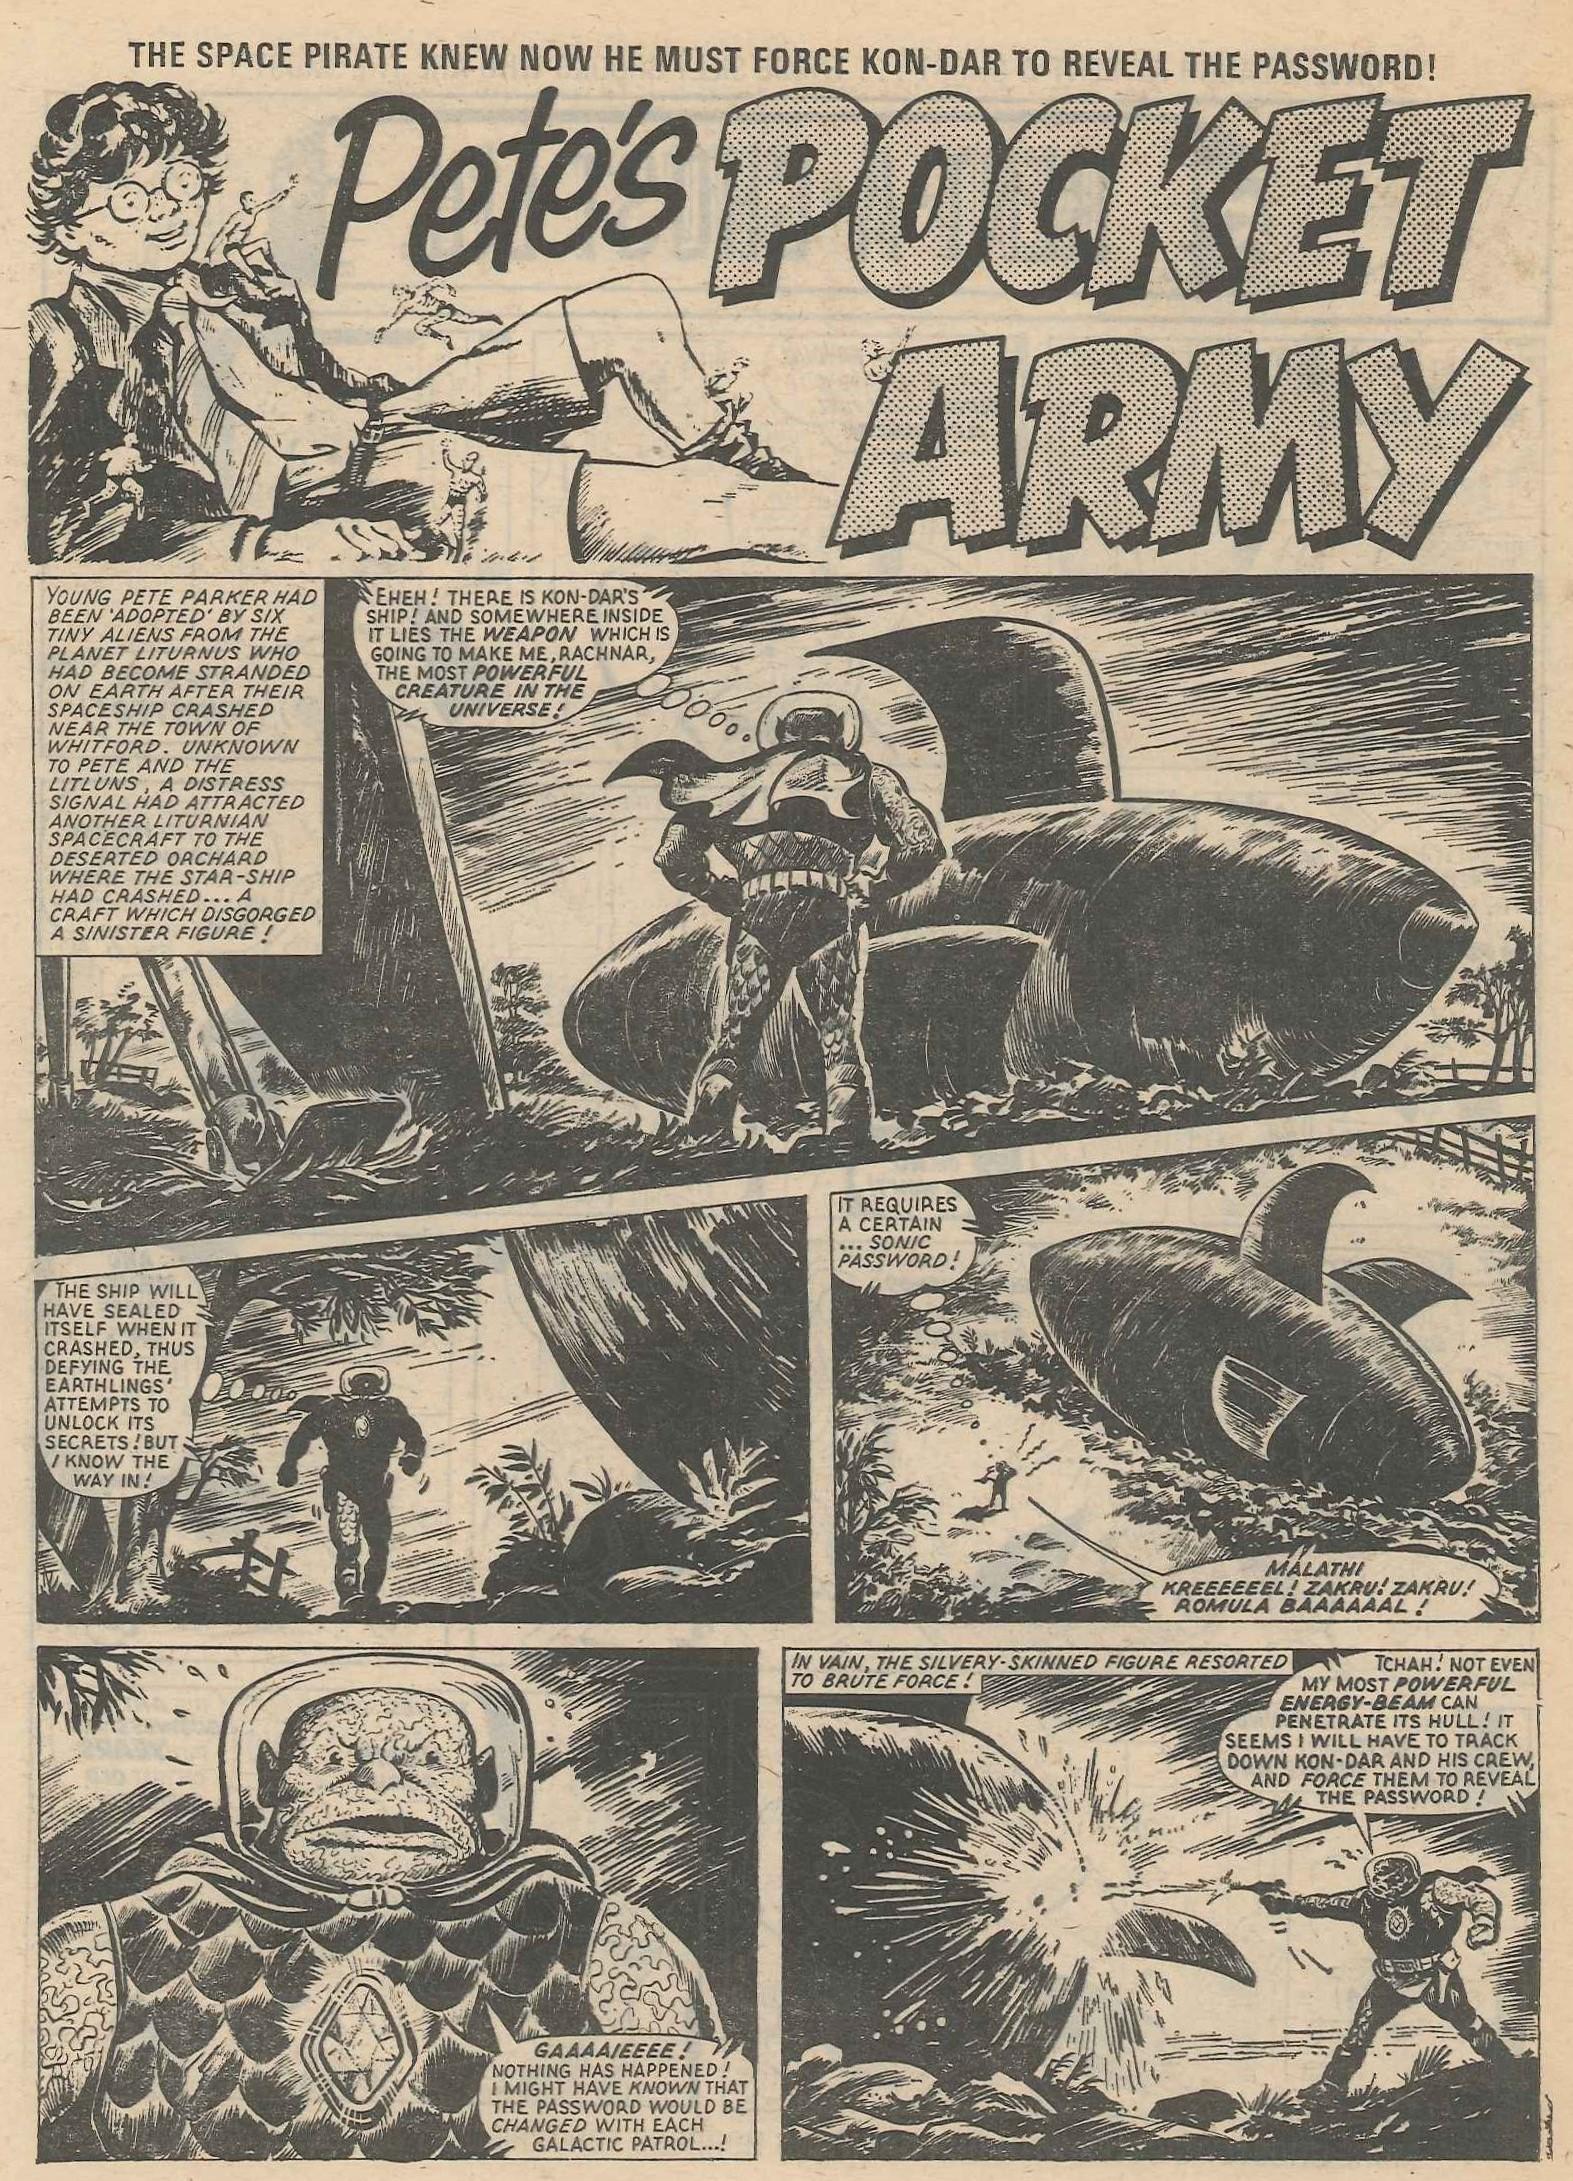 Pete's Pocket Army: Tom Tully (writer), Solano Lopez (artist)